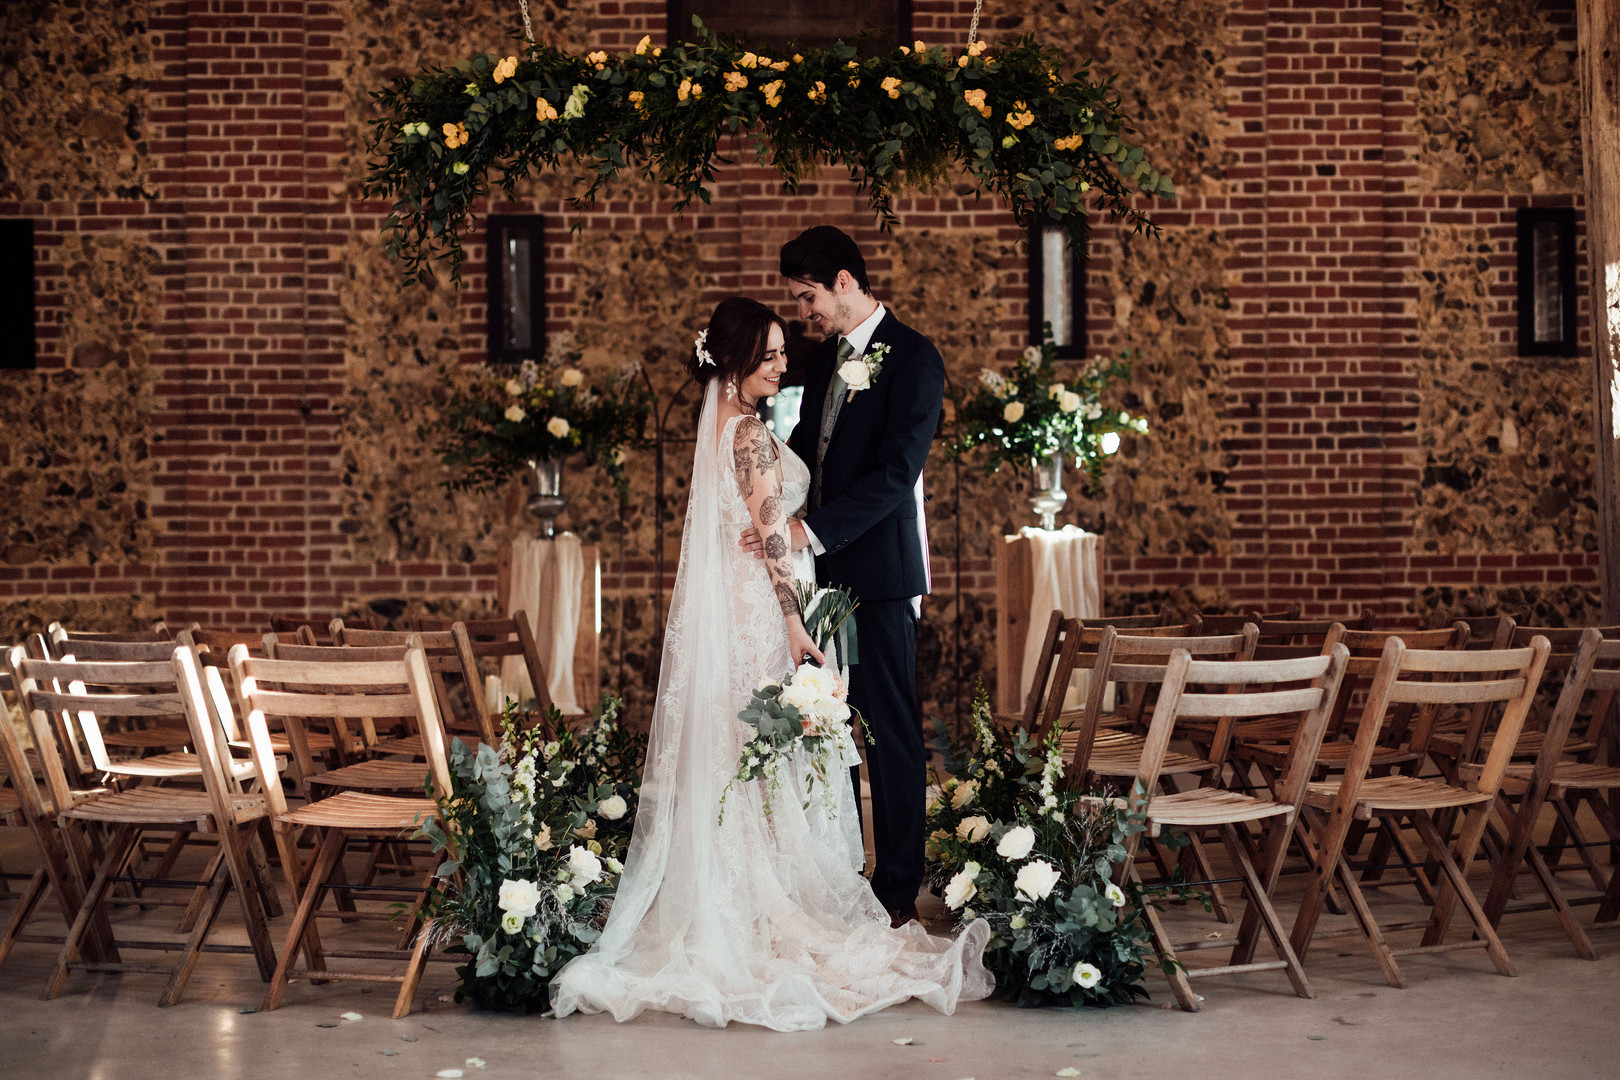 Tuffon hall vineyard wedding, Essex